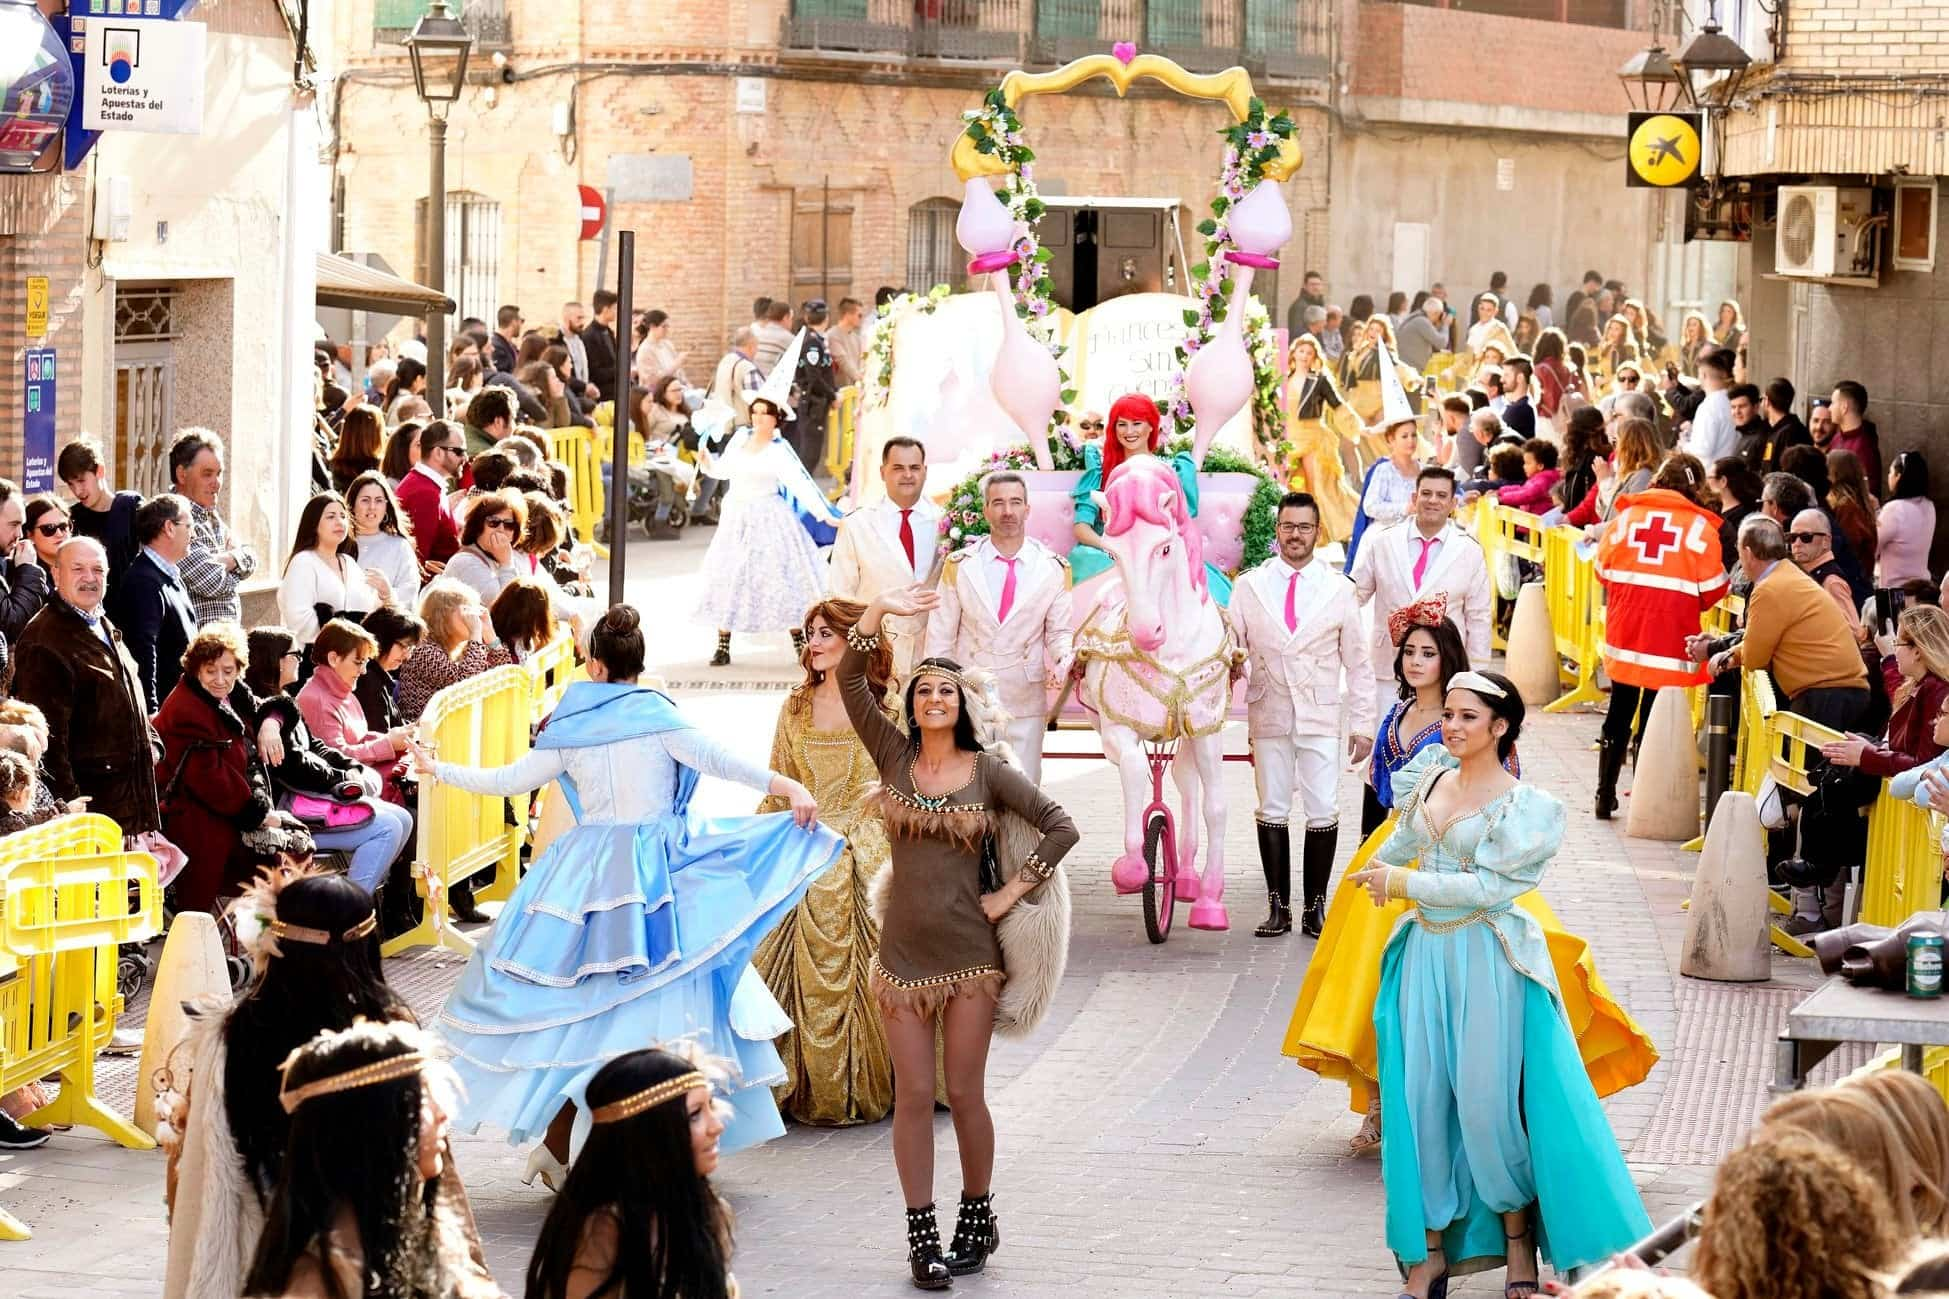 Carnaval de herencia 2020 ofertorio 43 - Selección de fotografías del Ofertorio del Carnaval de Herencia